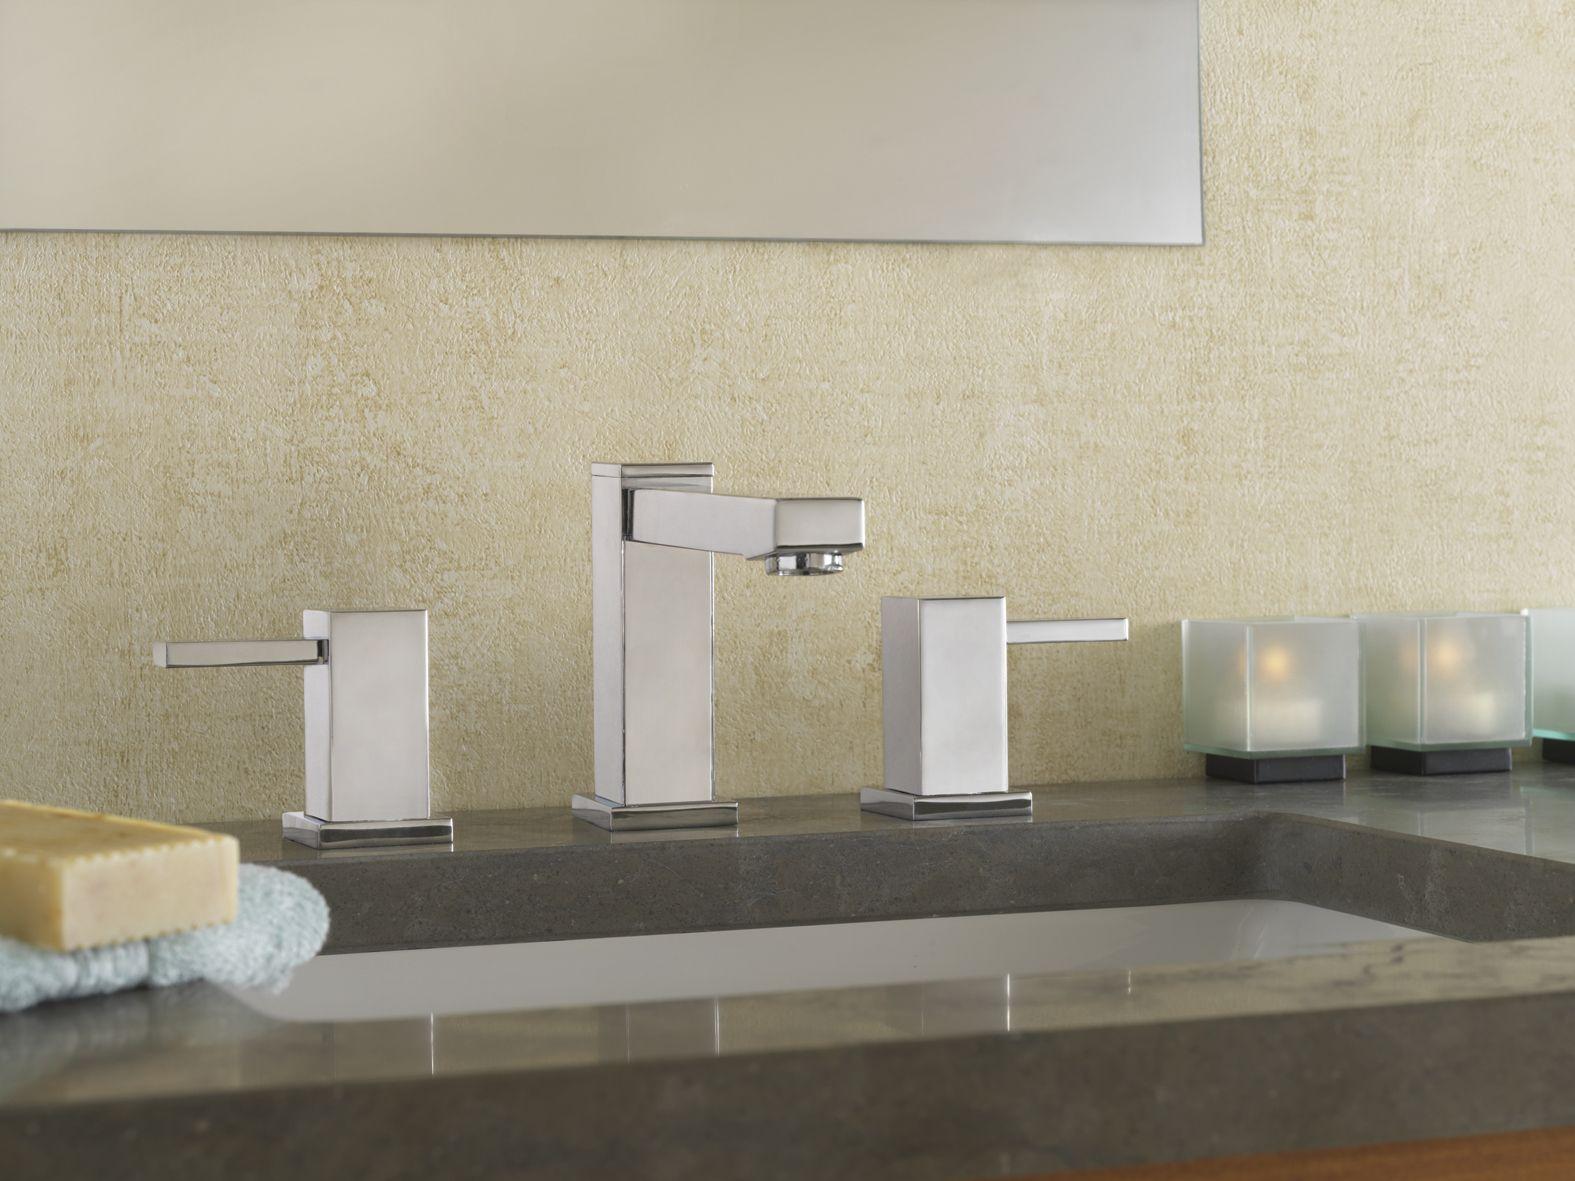 Danze Reef two handle widespread faucet! D304033   Danze in the ...